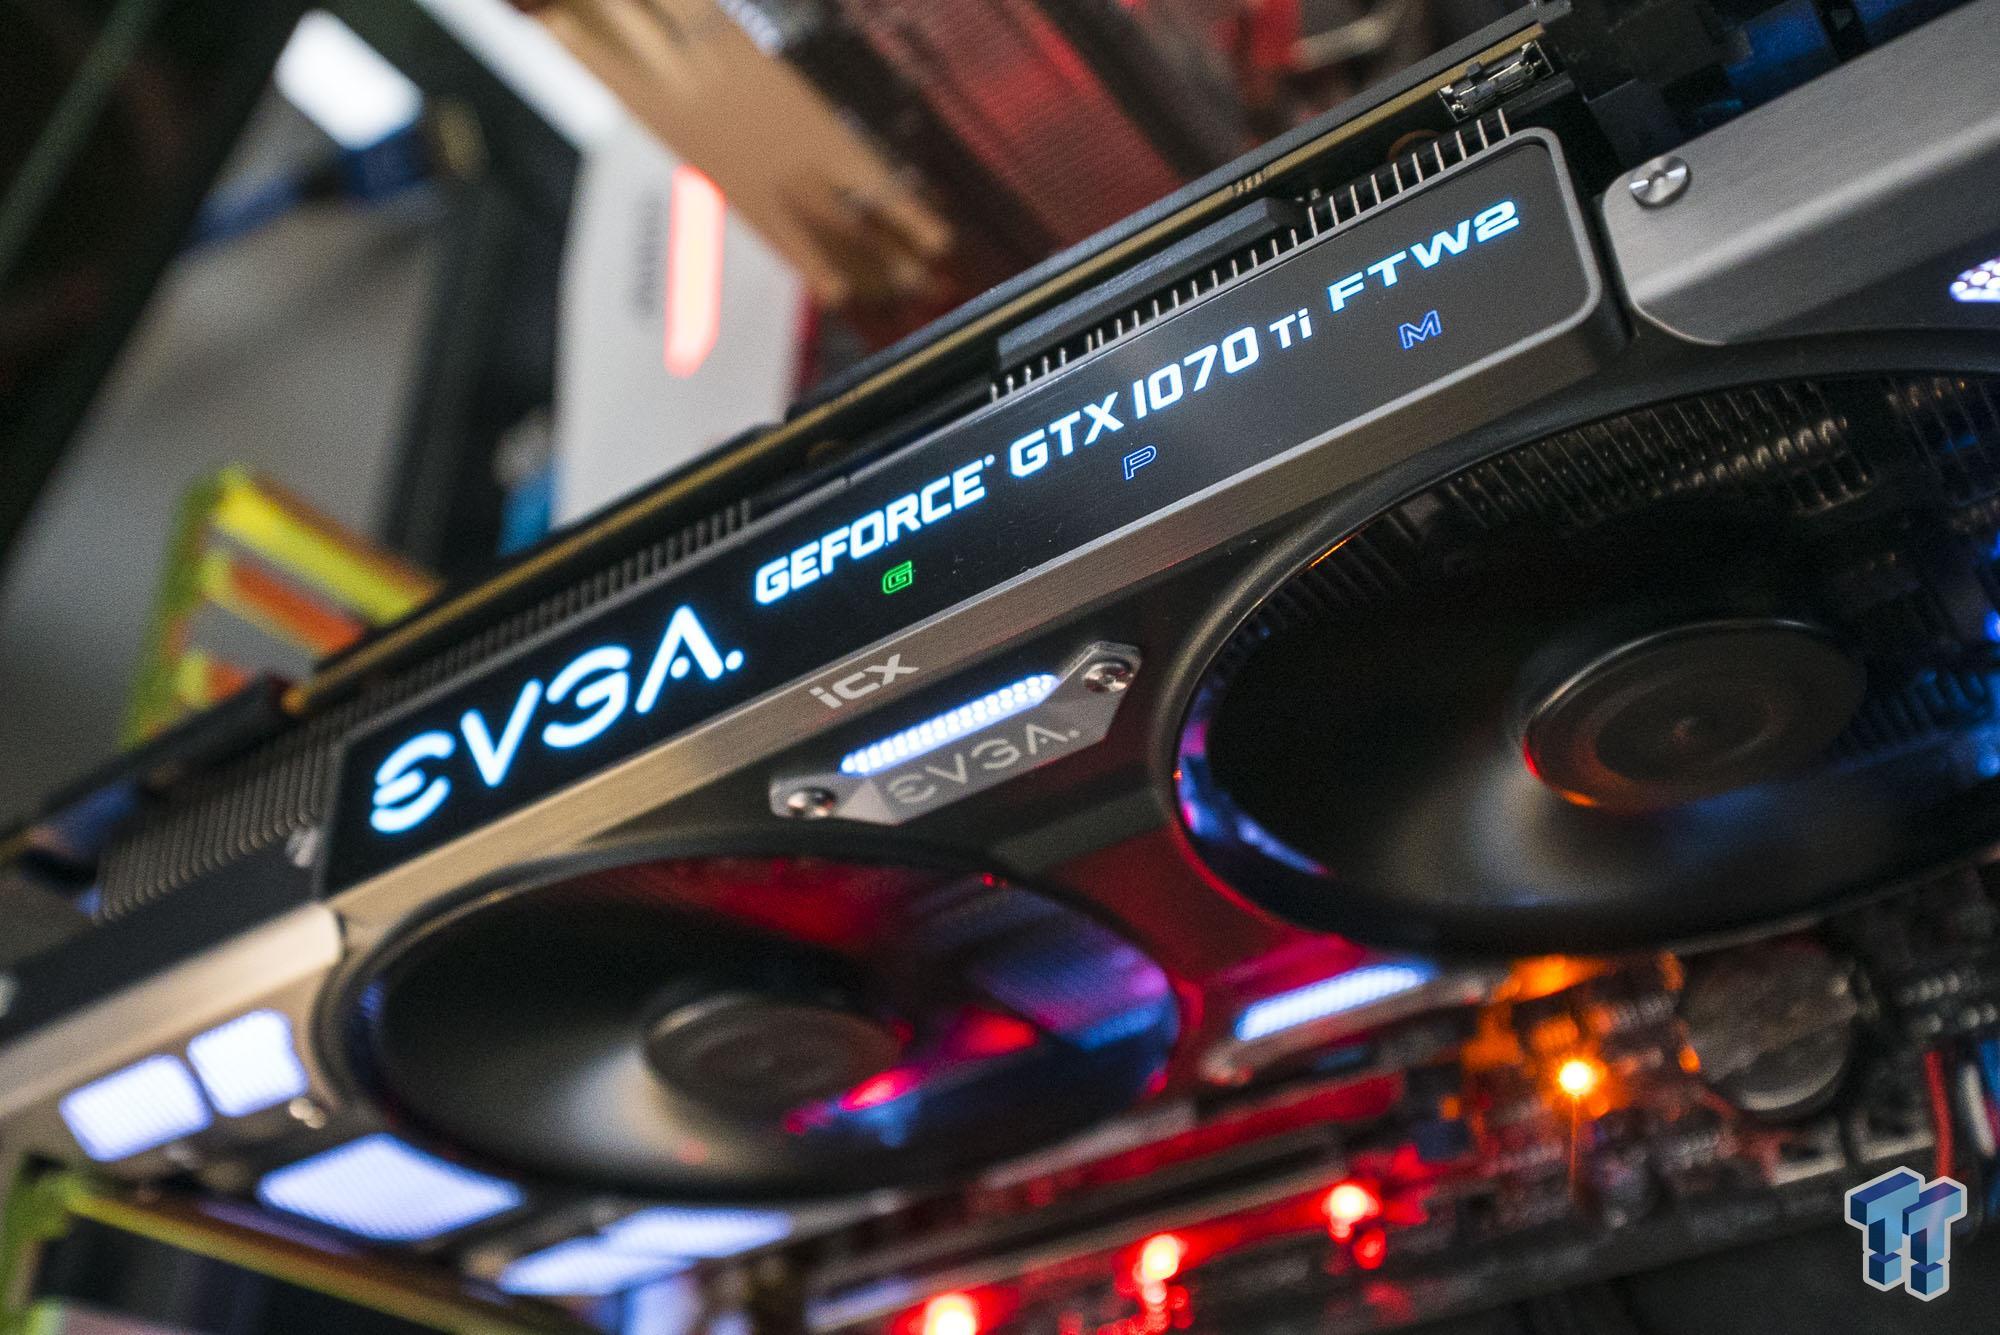 EVGA GeForce GTX 1070 Ti FTW2 Graphics Card Review